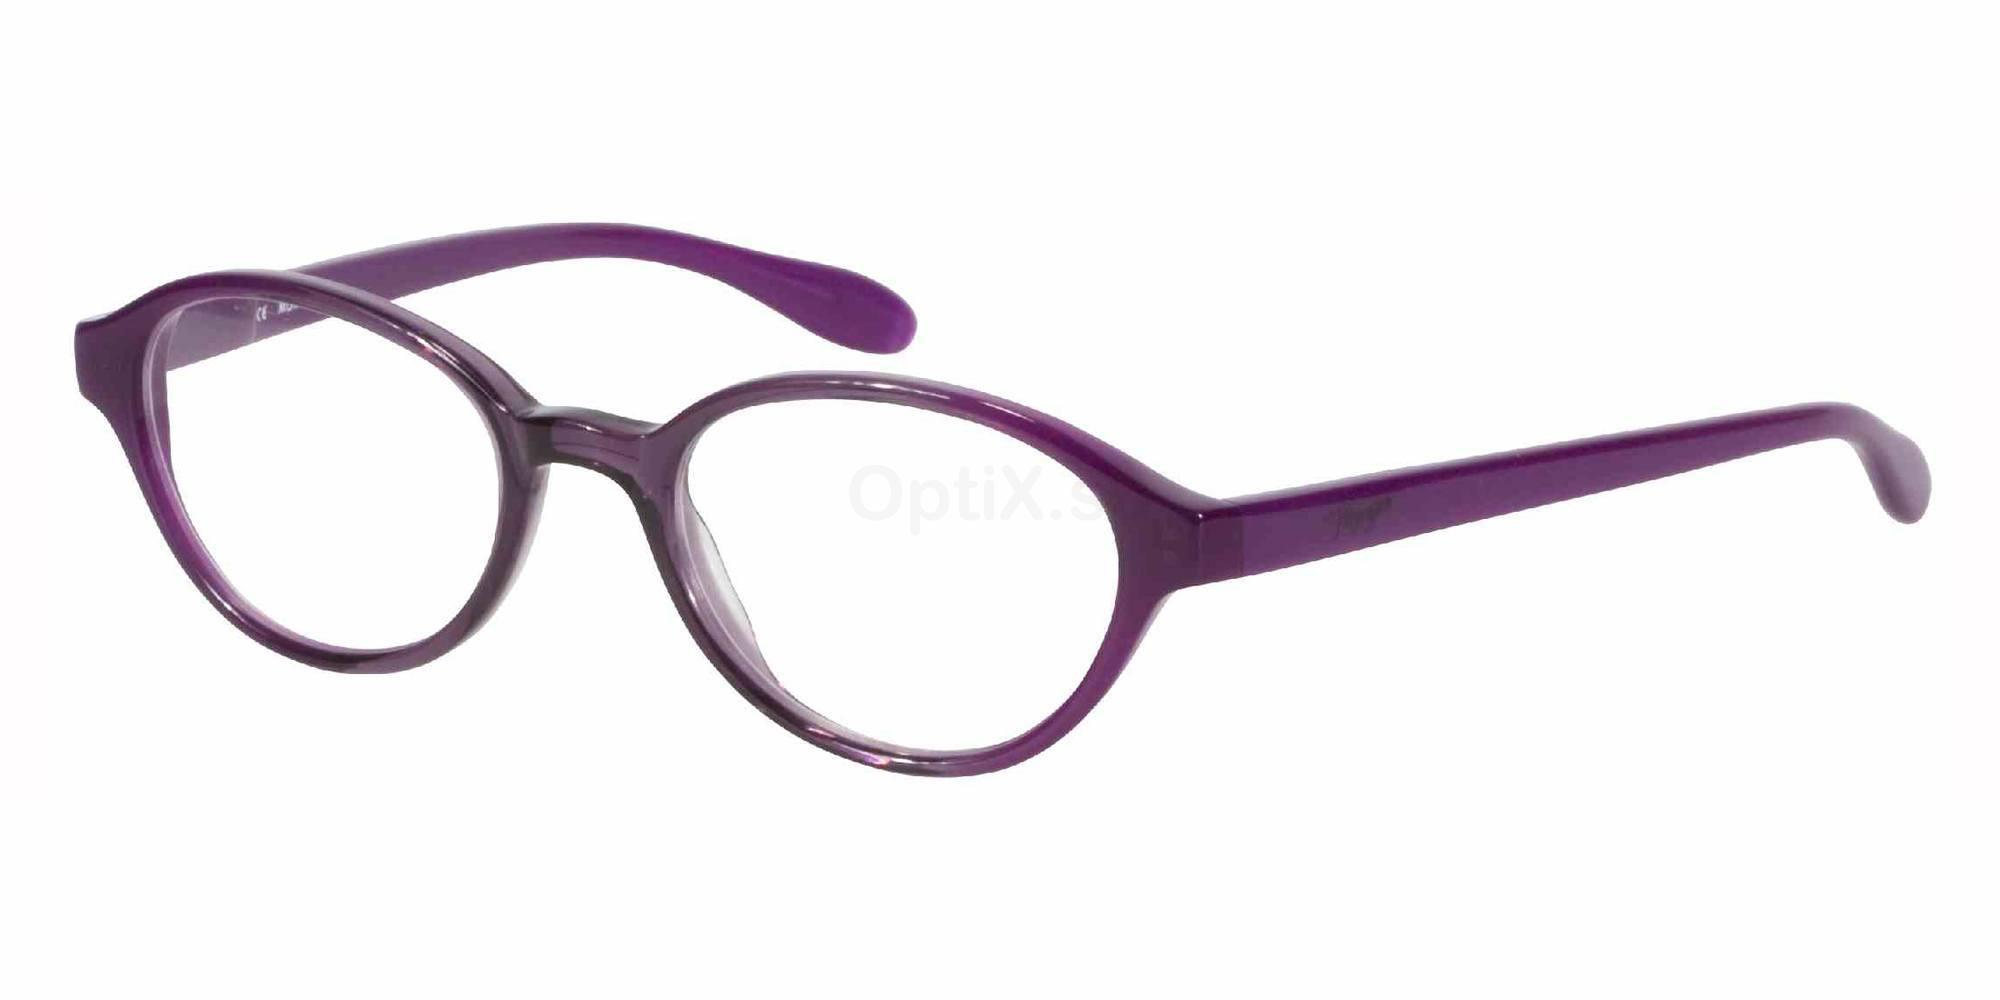 6323 201040 , MORGAN Eyewear